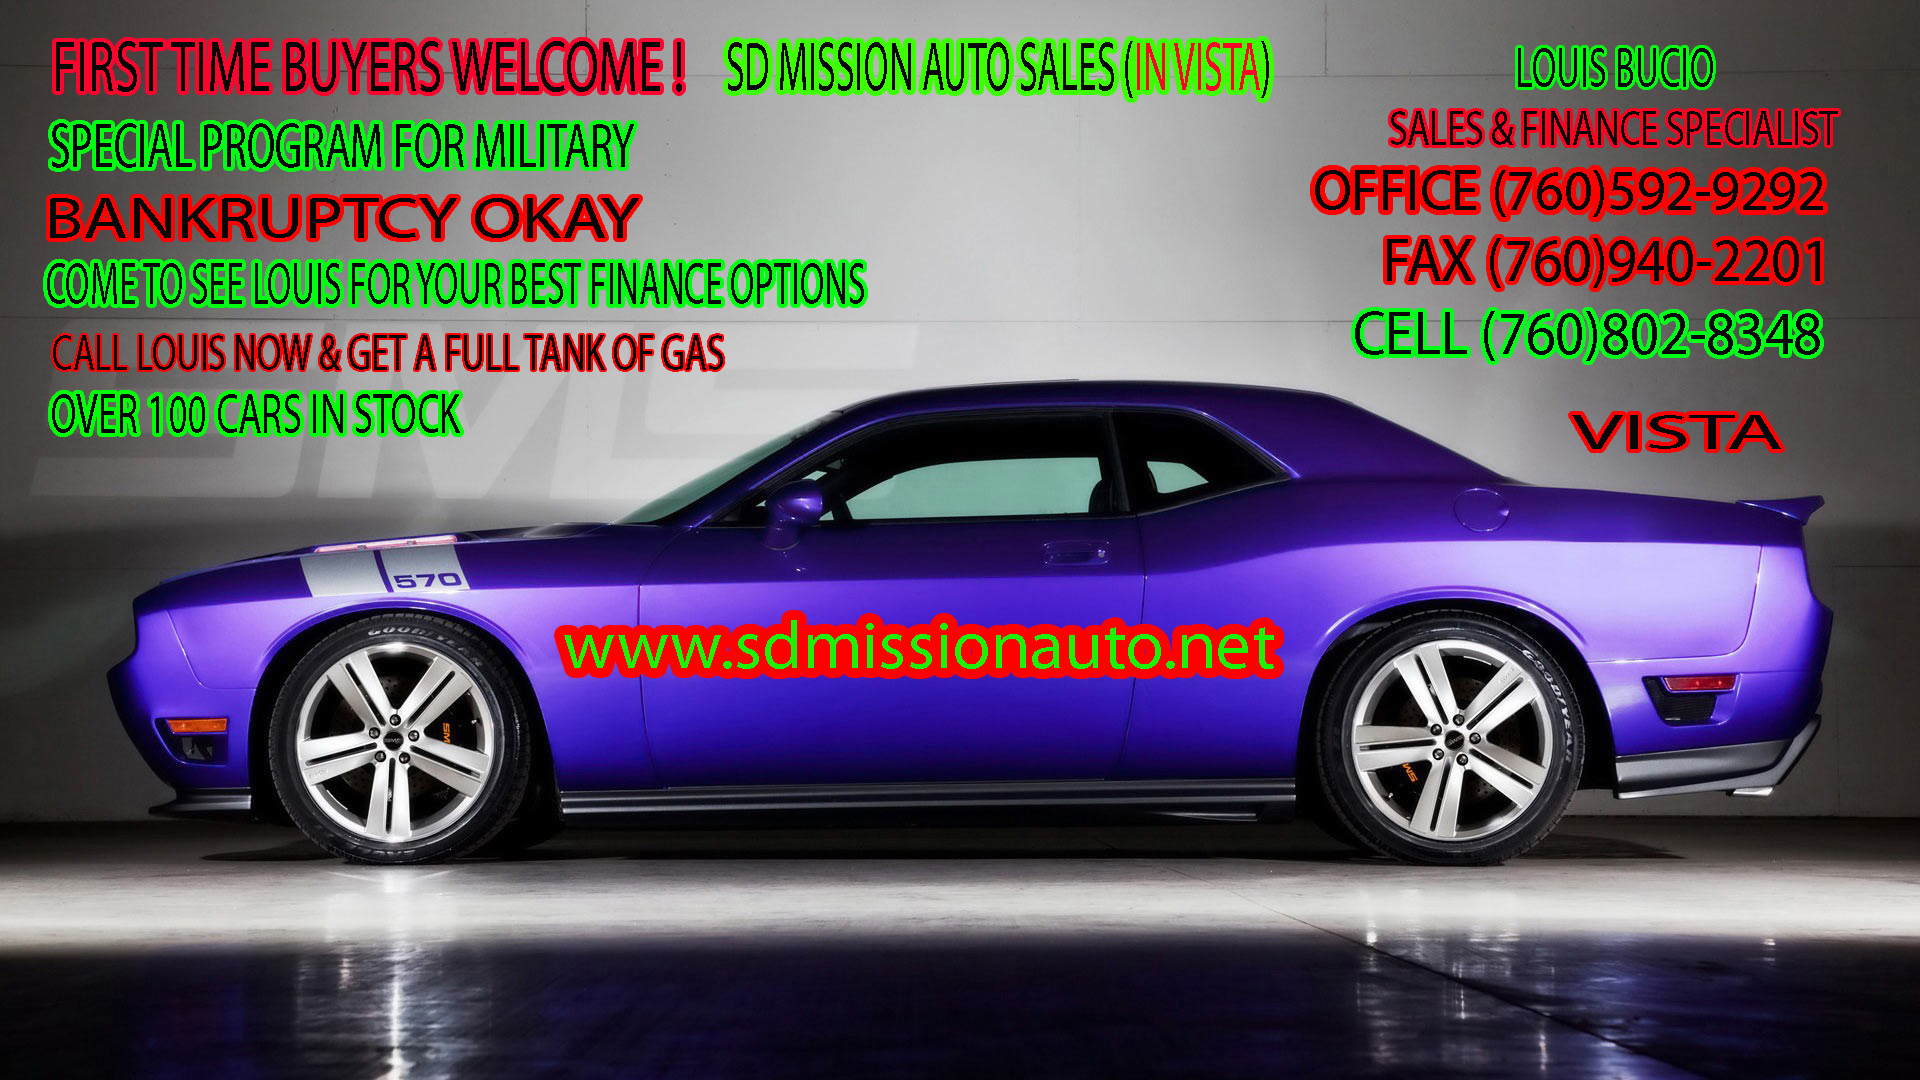 San Diego Mission Auto Sales